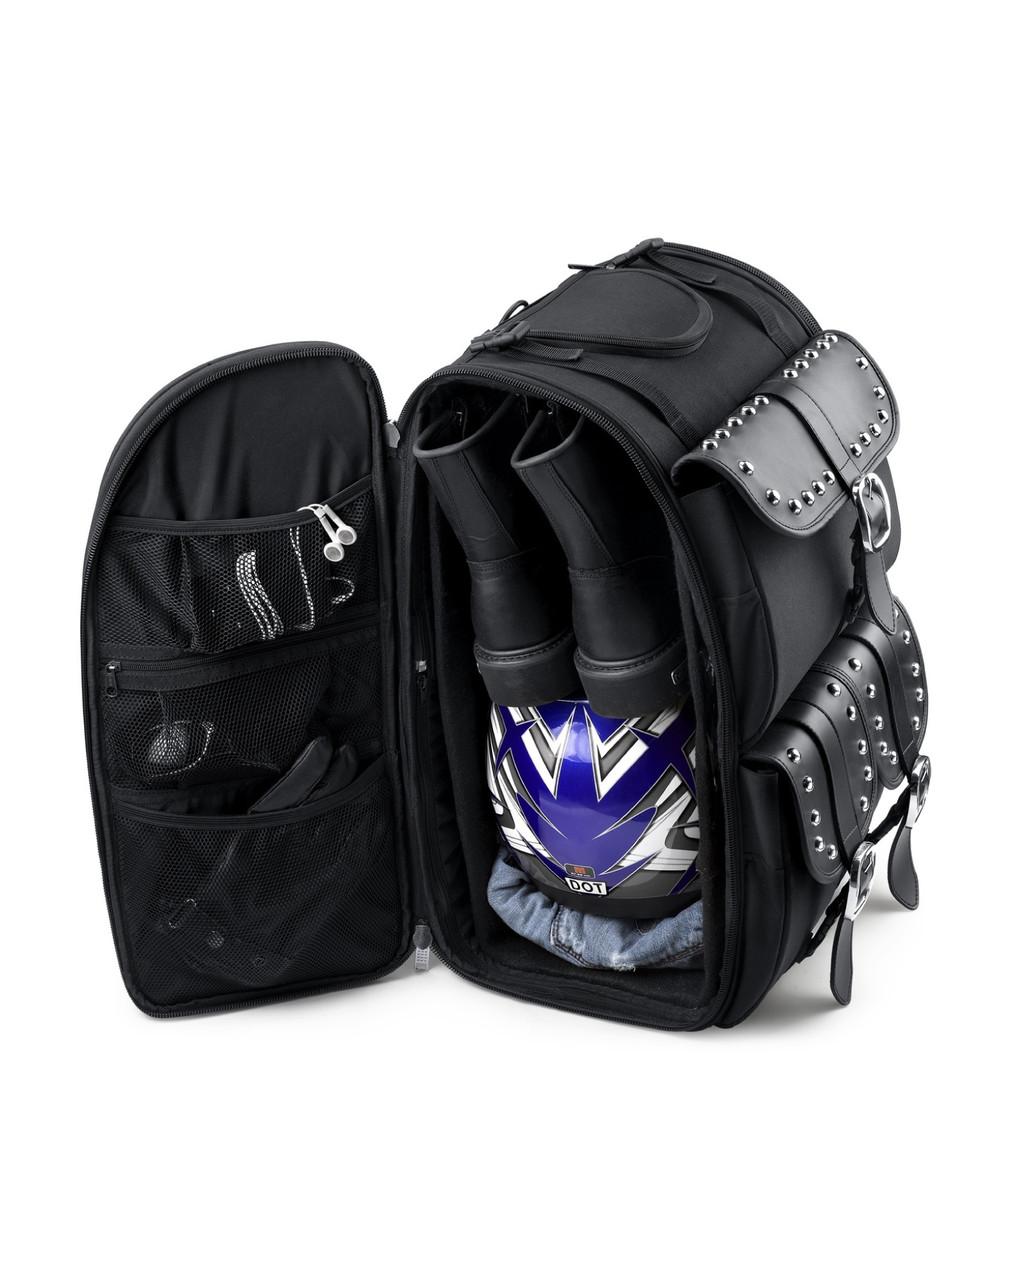 VikingBags Extra Large Studded Motorcycle Sissy Bar Bag For Harley Davidson Storage View